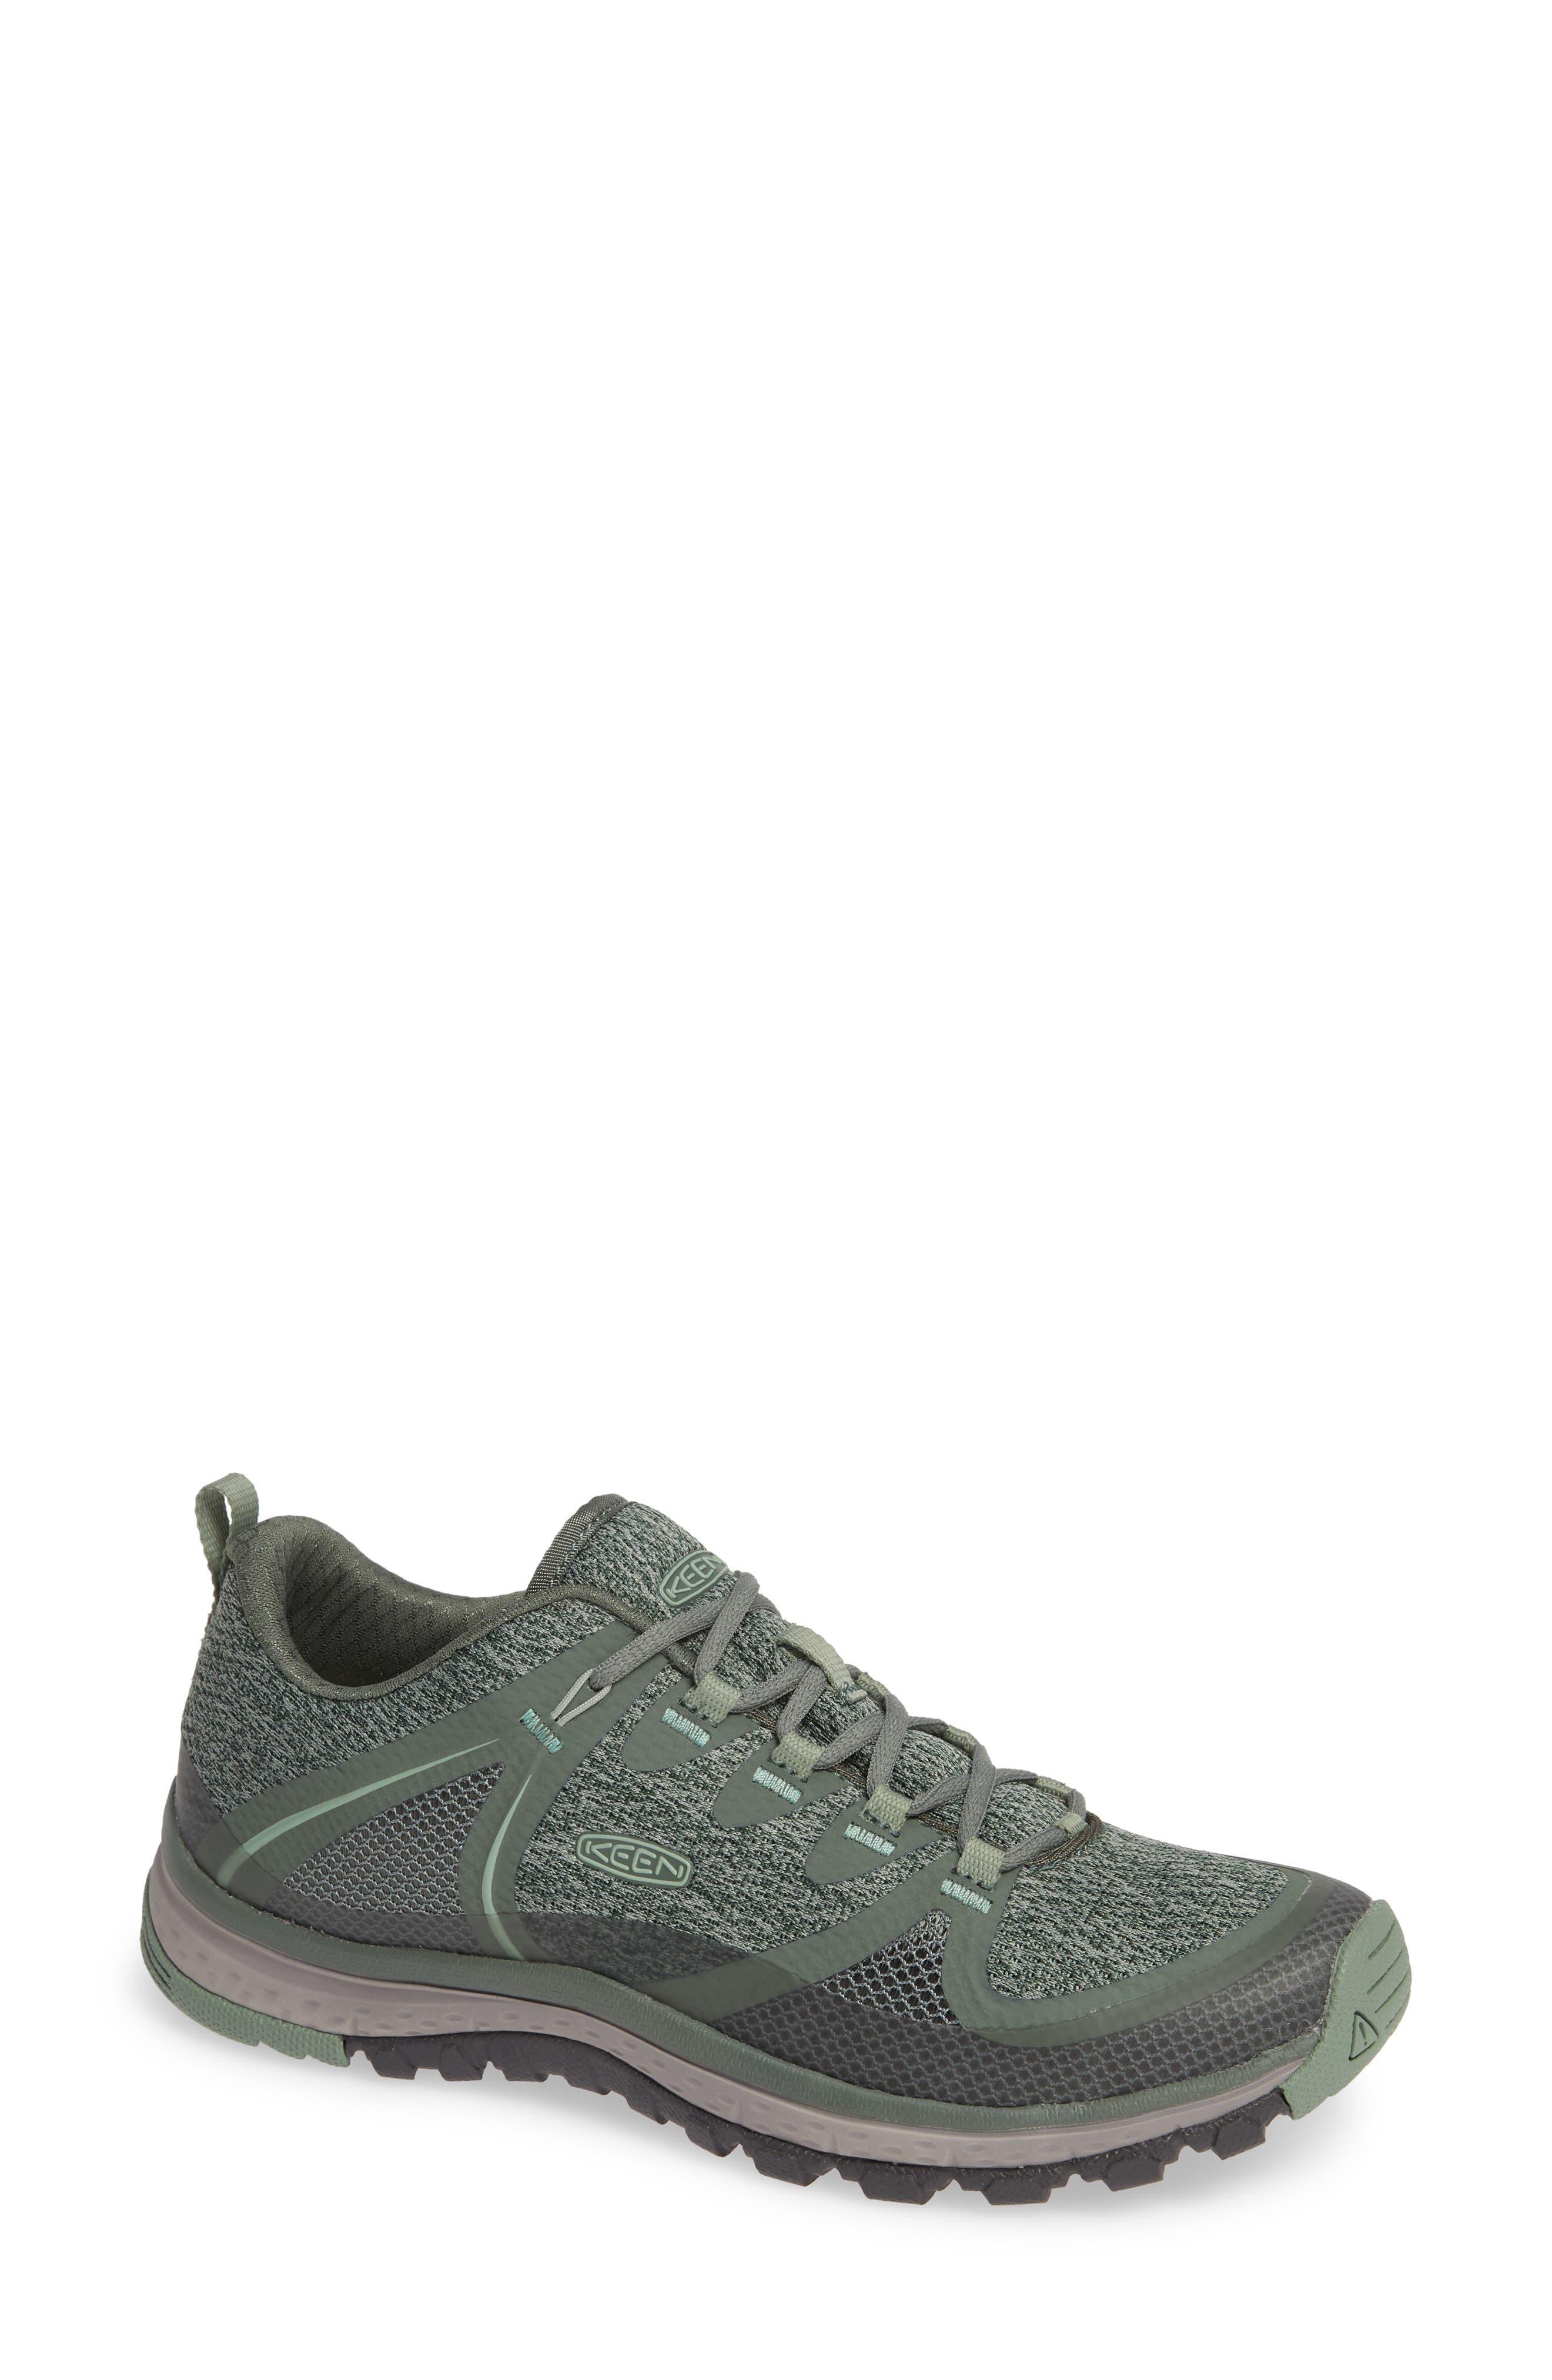 KEEN Terradora Vent Hiking Shoe, Main, color, LAUREL WREATH/ LILY PAD FABRIC